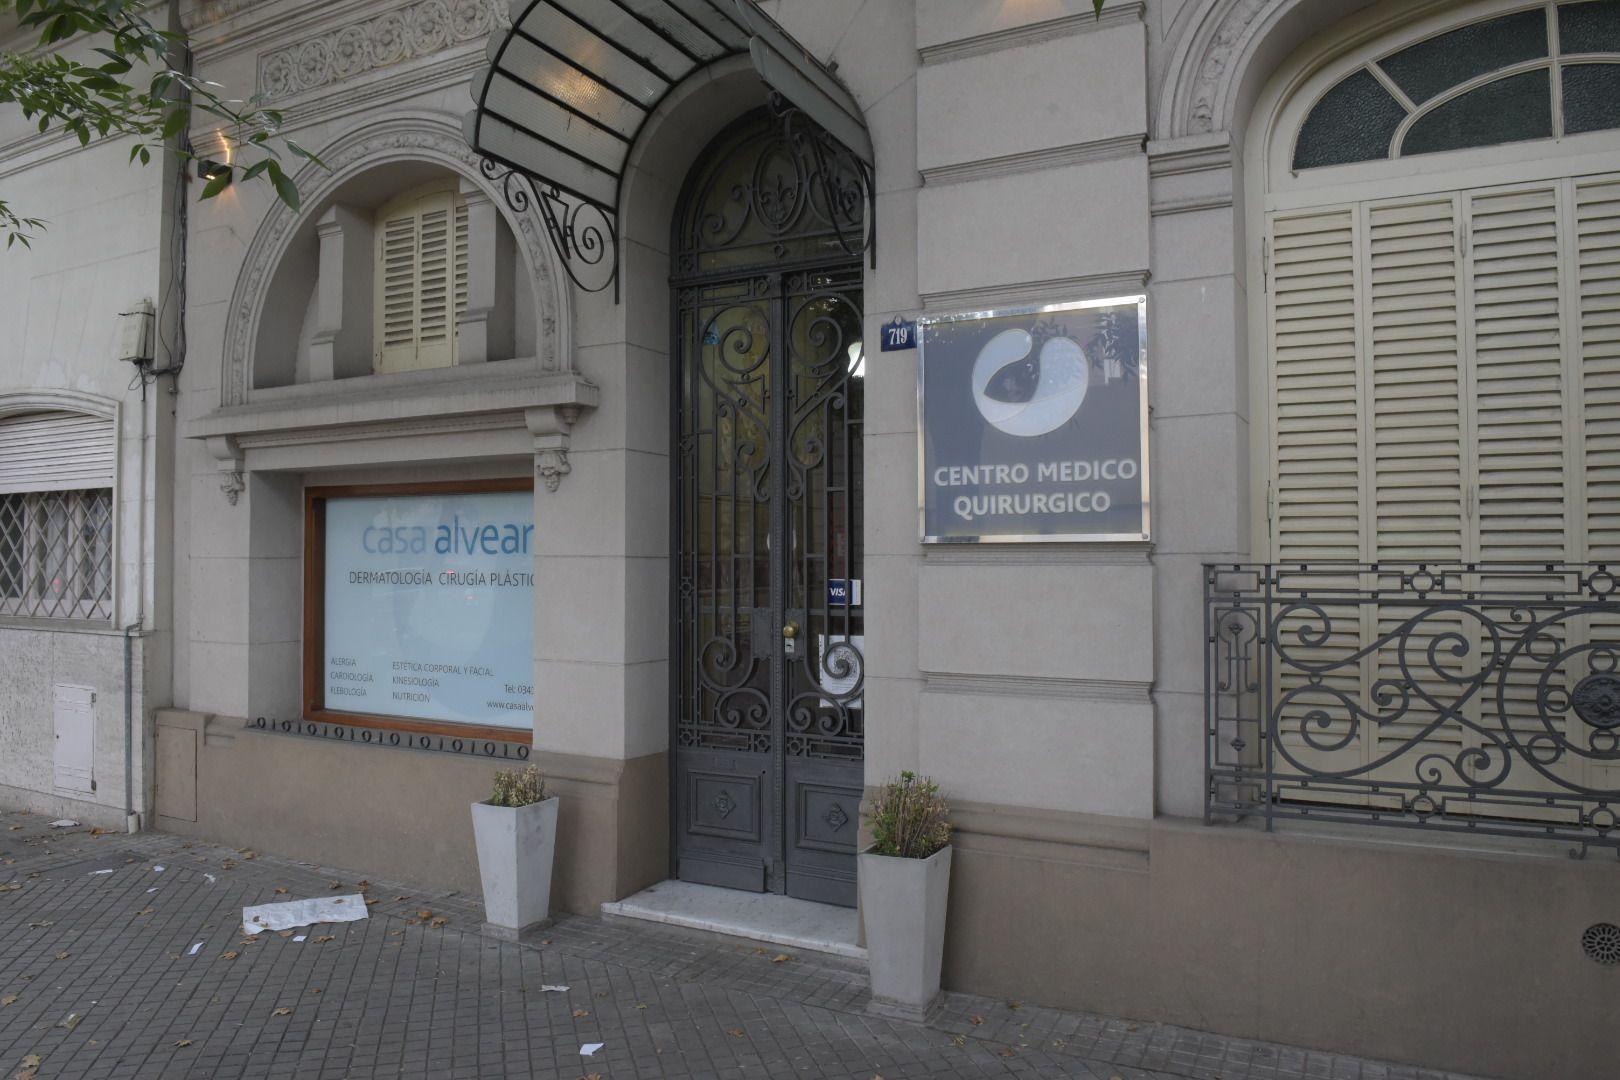 La clínica asaltada ayer a la tarde. (Foto La Capital: Sebastián S. Meccia)